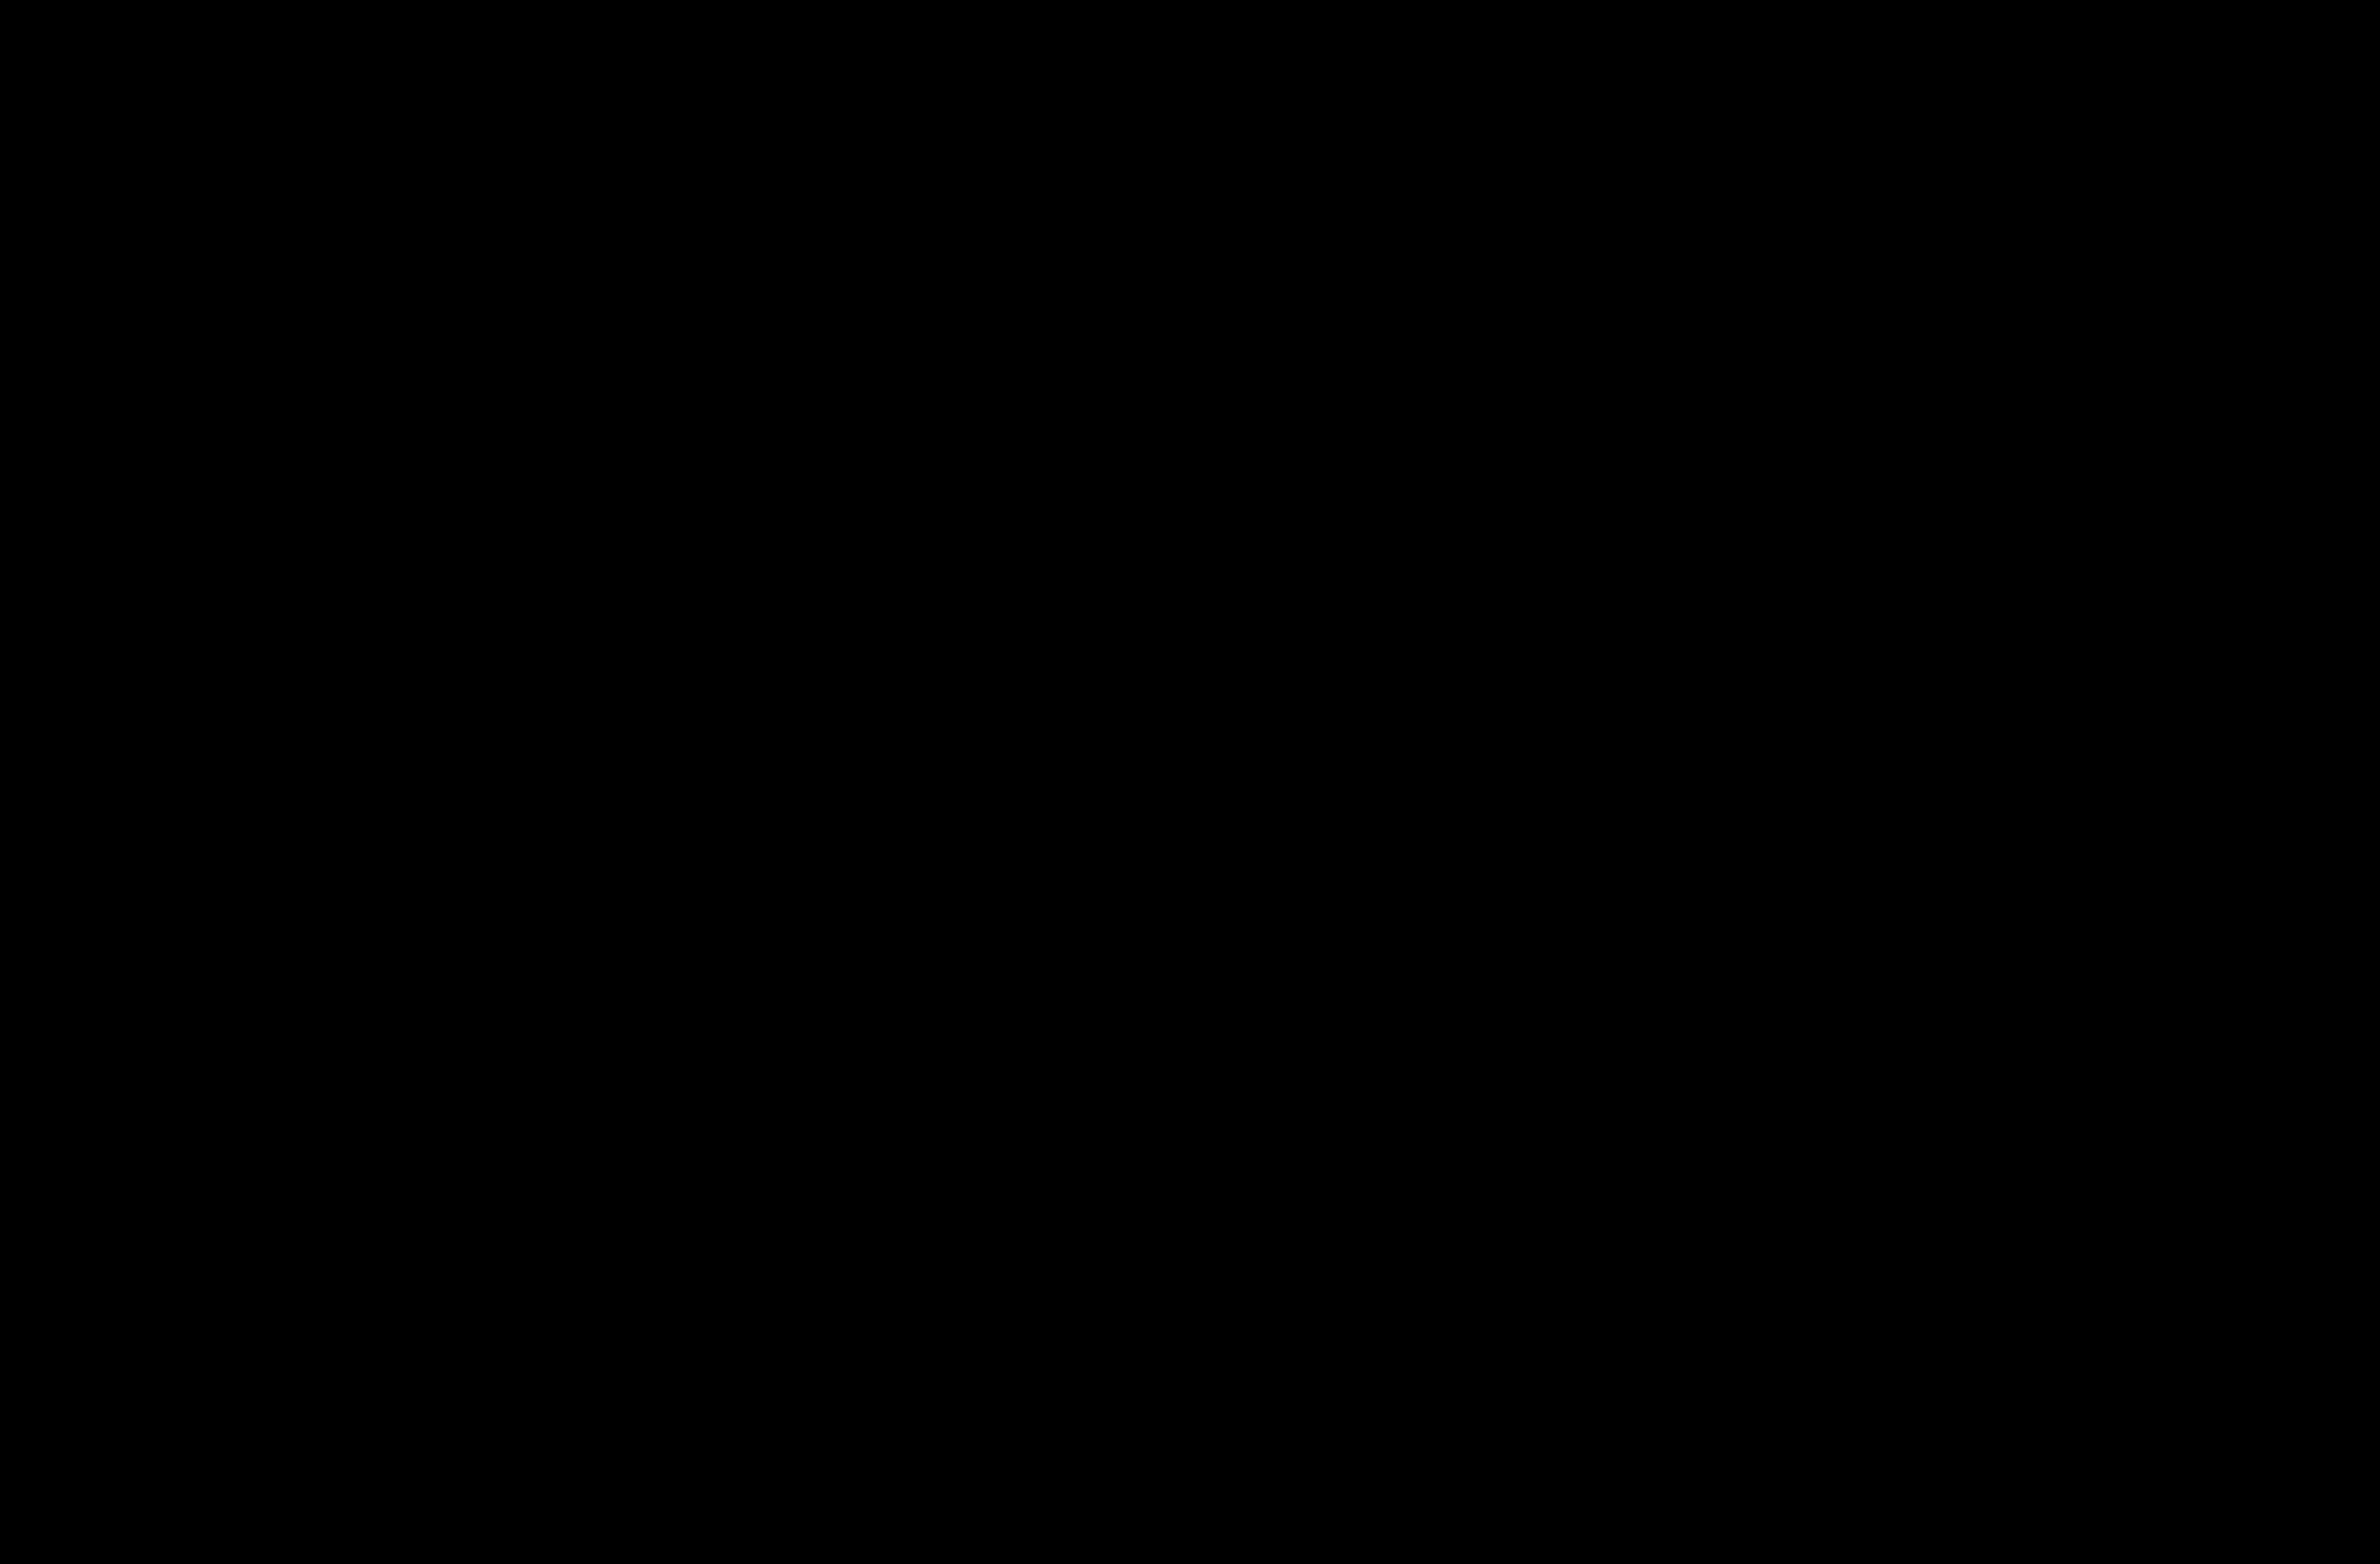 2019 02 02 16.20.58